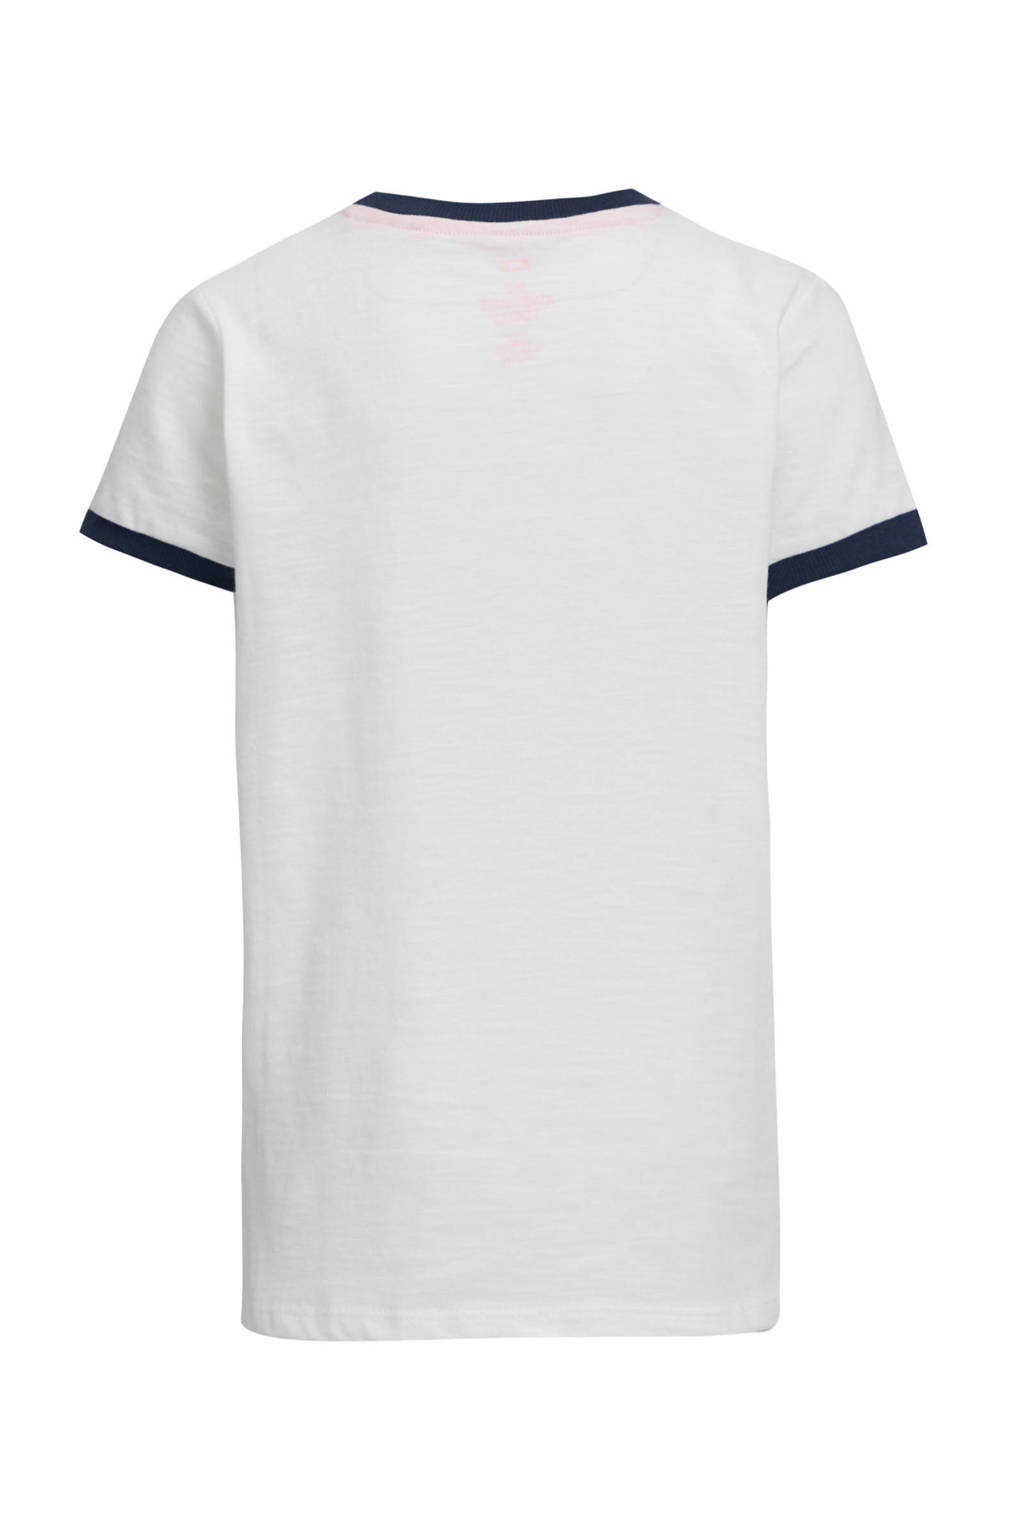 WE Fashion T-shirt met contrastbies en borduursels wit, Wit